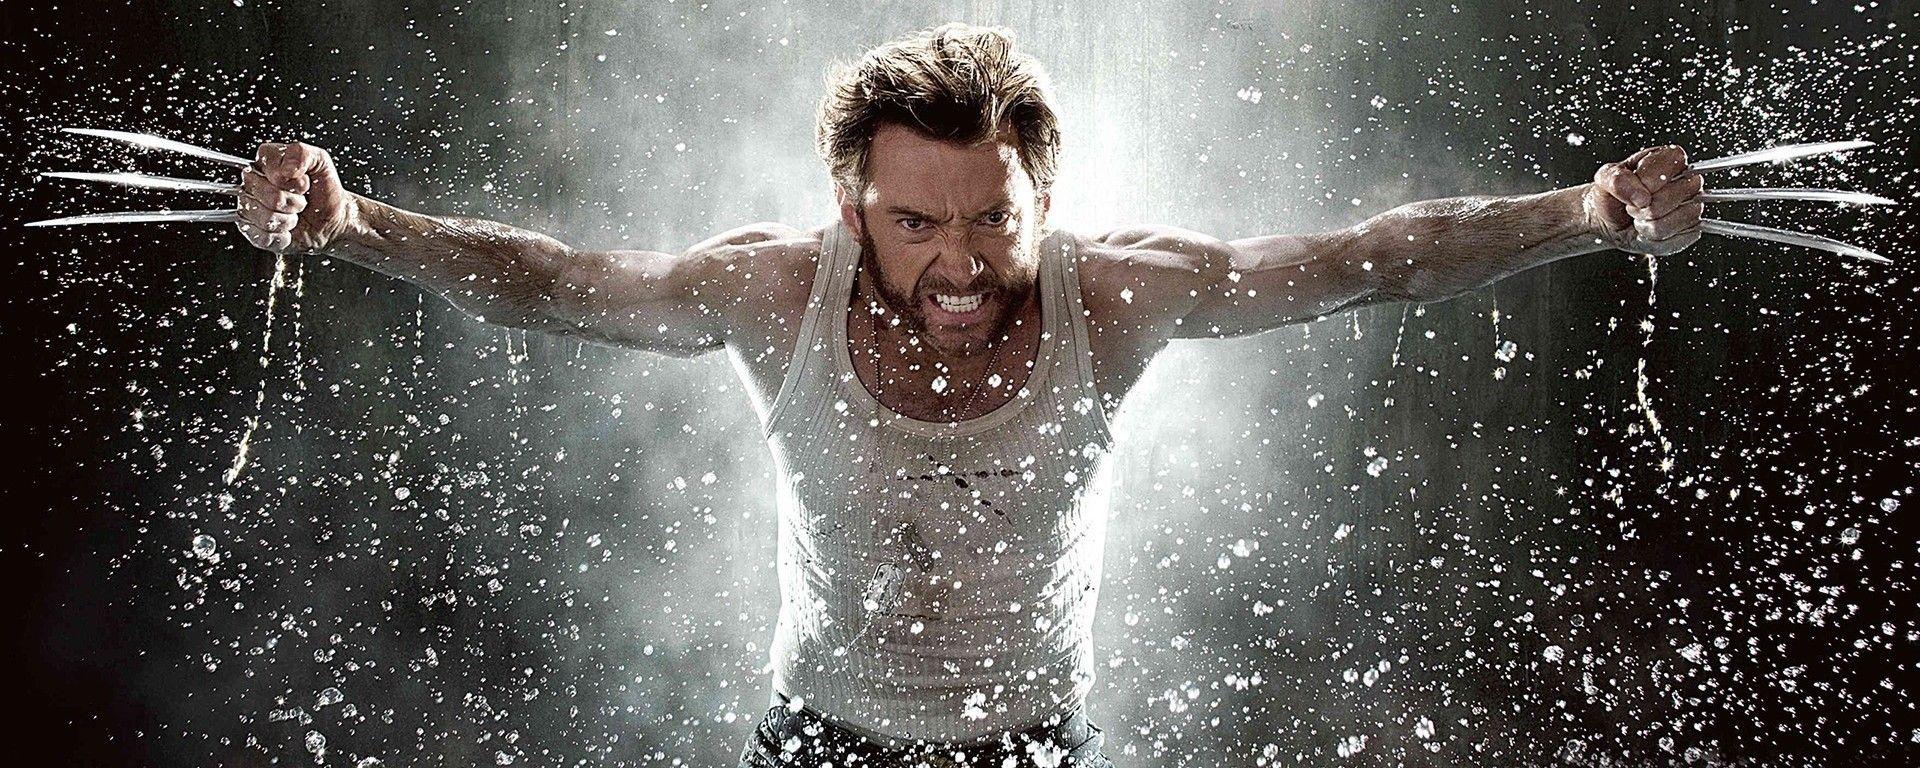 Hugh Jackman (Wolverine) sarà Enzo Ferrari nel biopic di Michael Mann